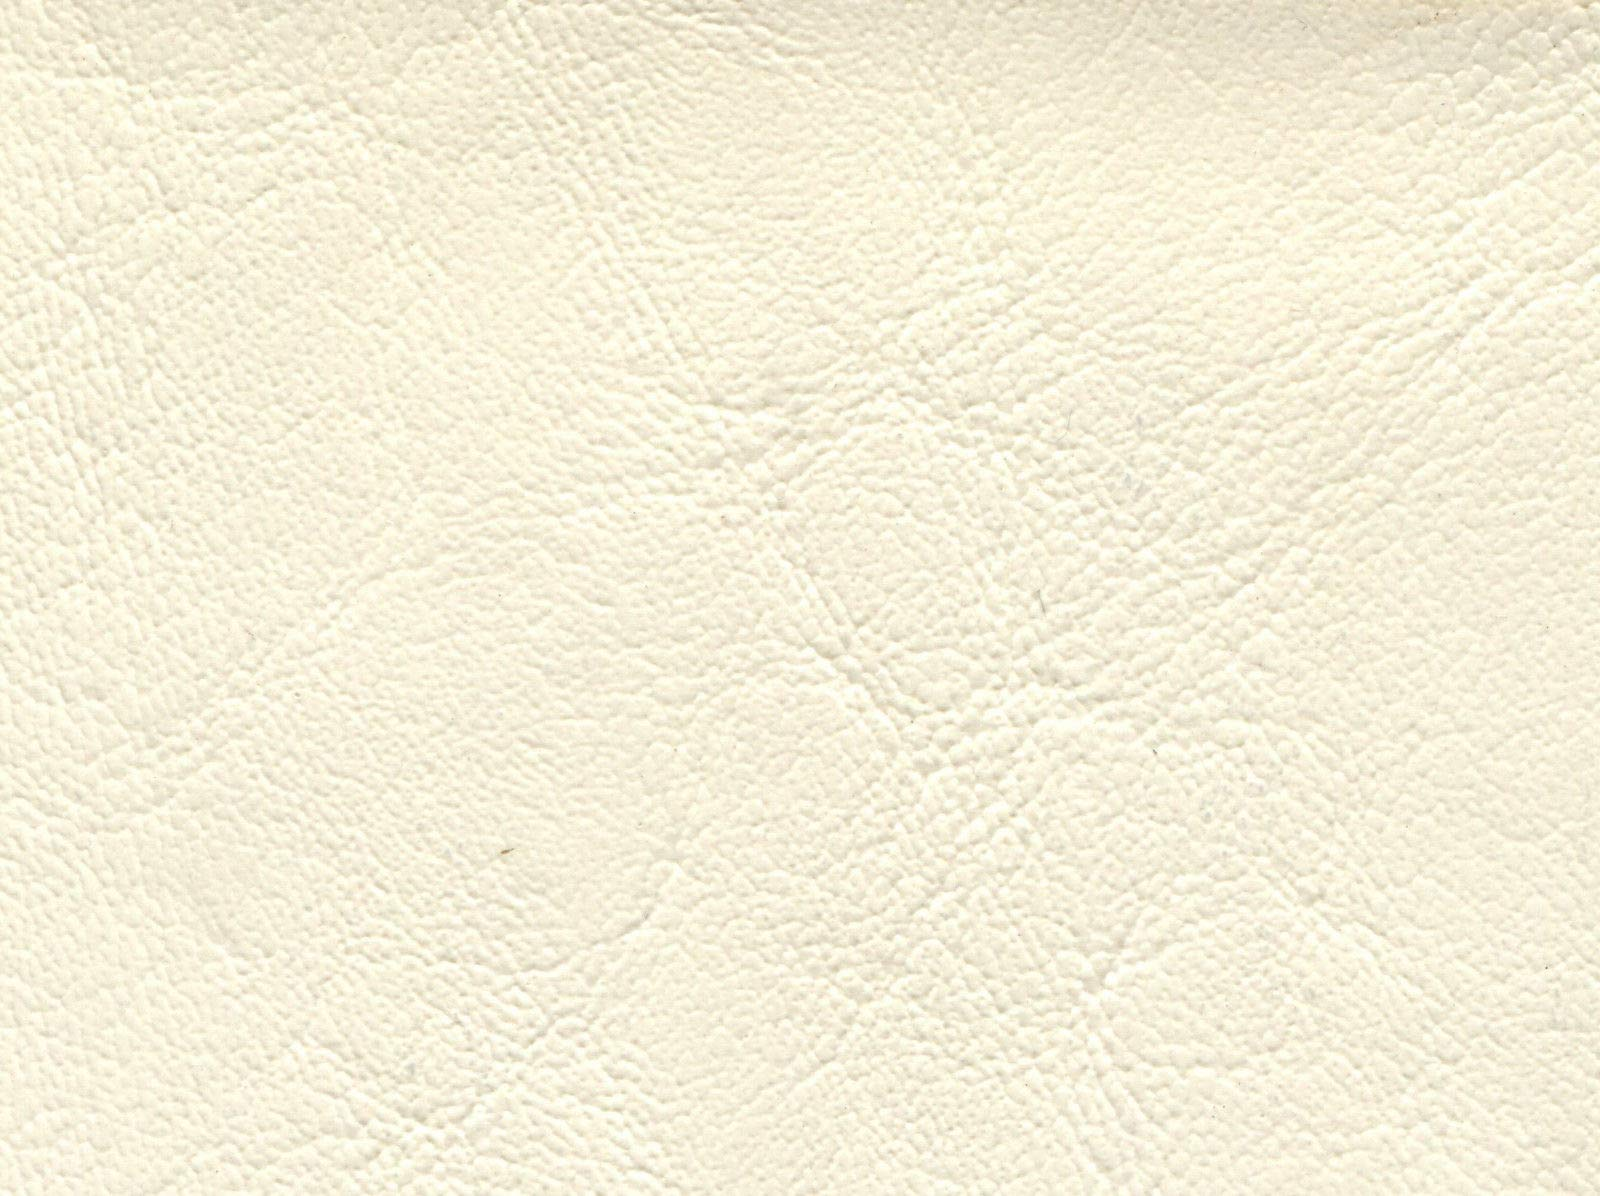 Bry-Tech SMV Marine Outdoor Indoor Vinyl Fabric Vanilla Off White 54'' Wide by 5 Yards